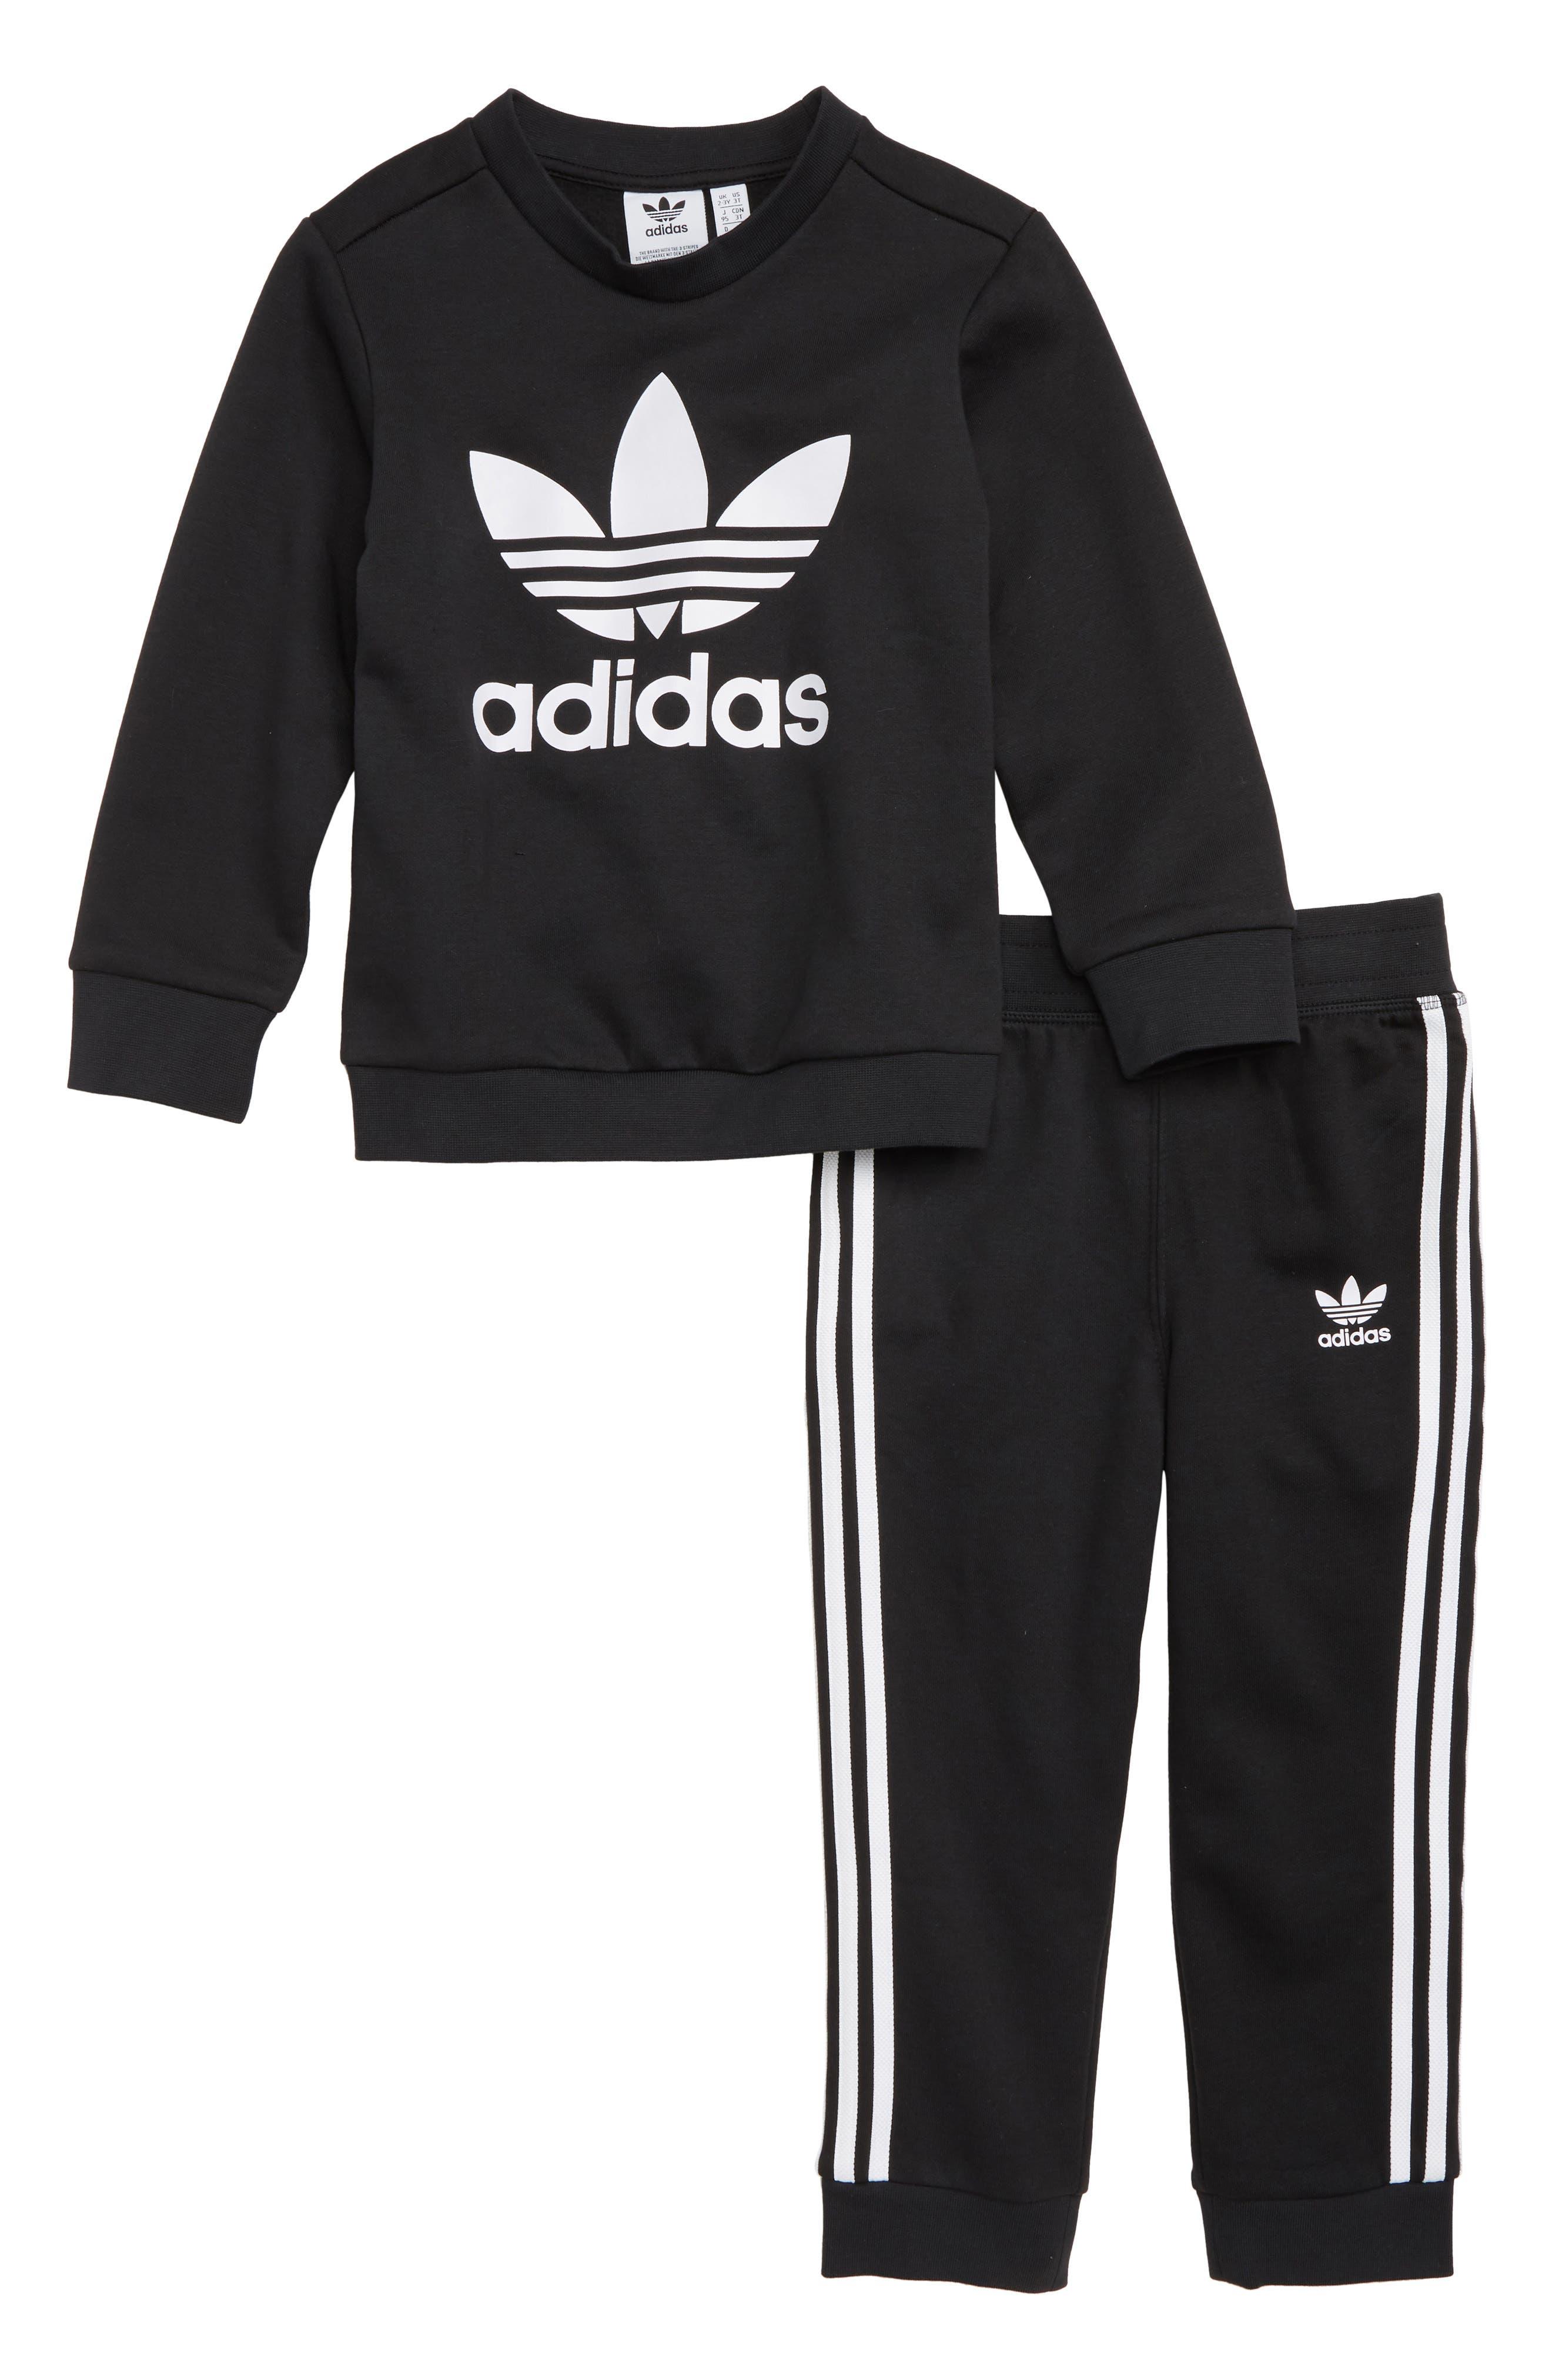 Toddler Boys Adidas Originals Trefoil Tracksuit